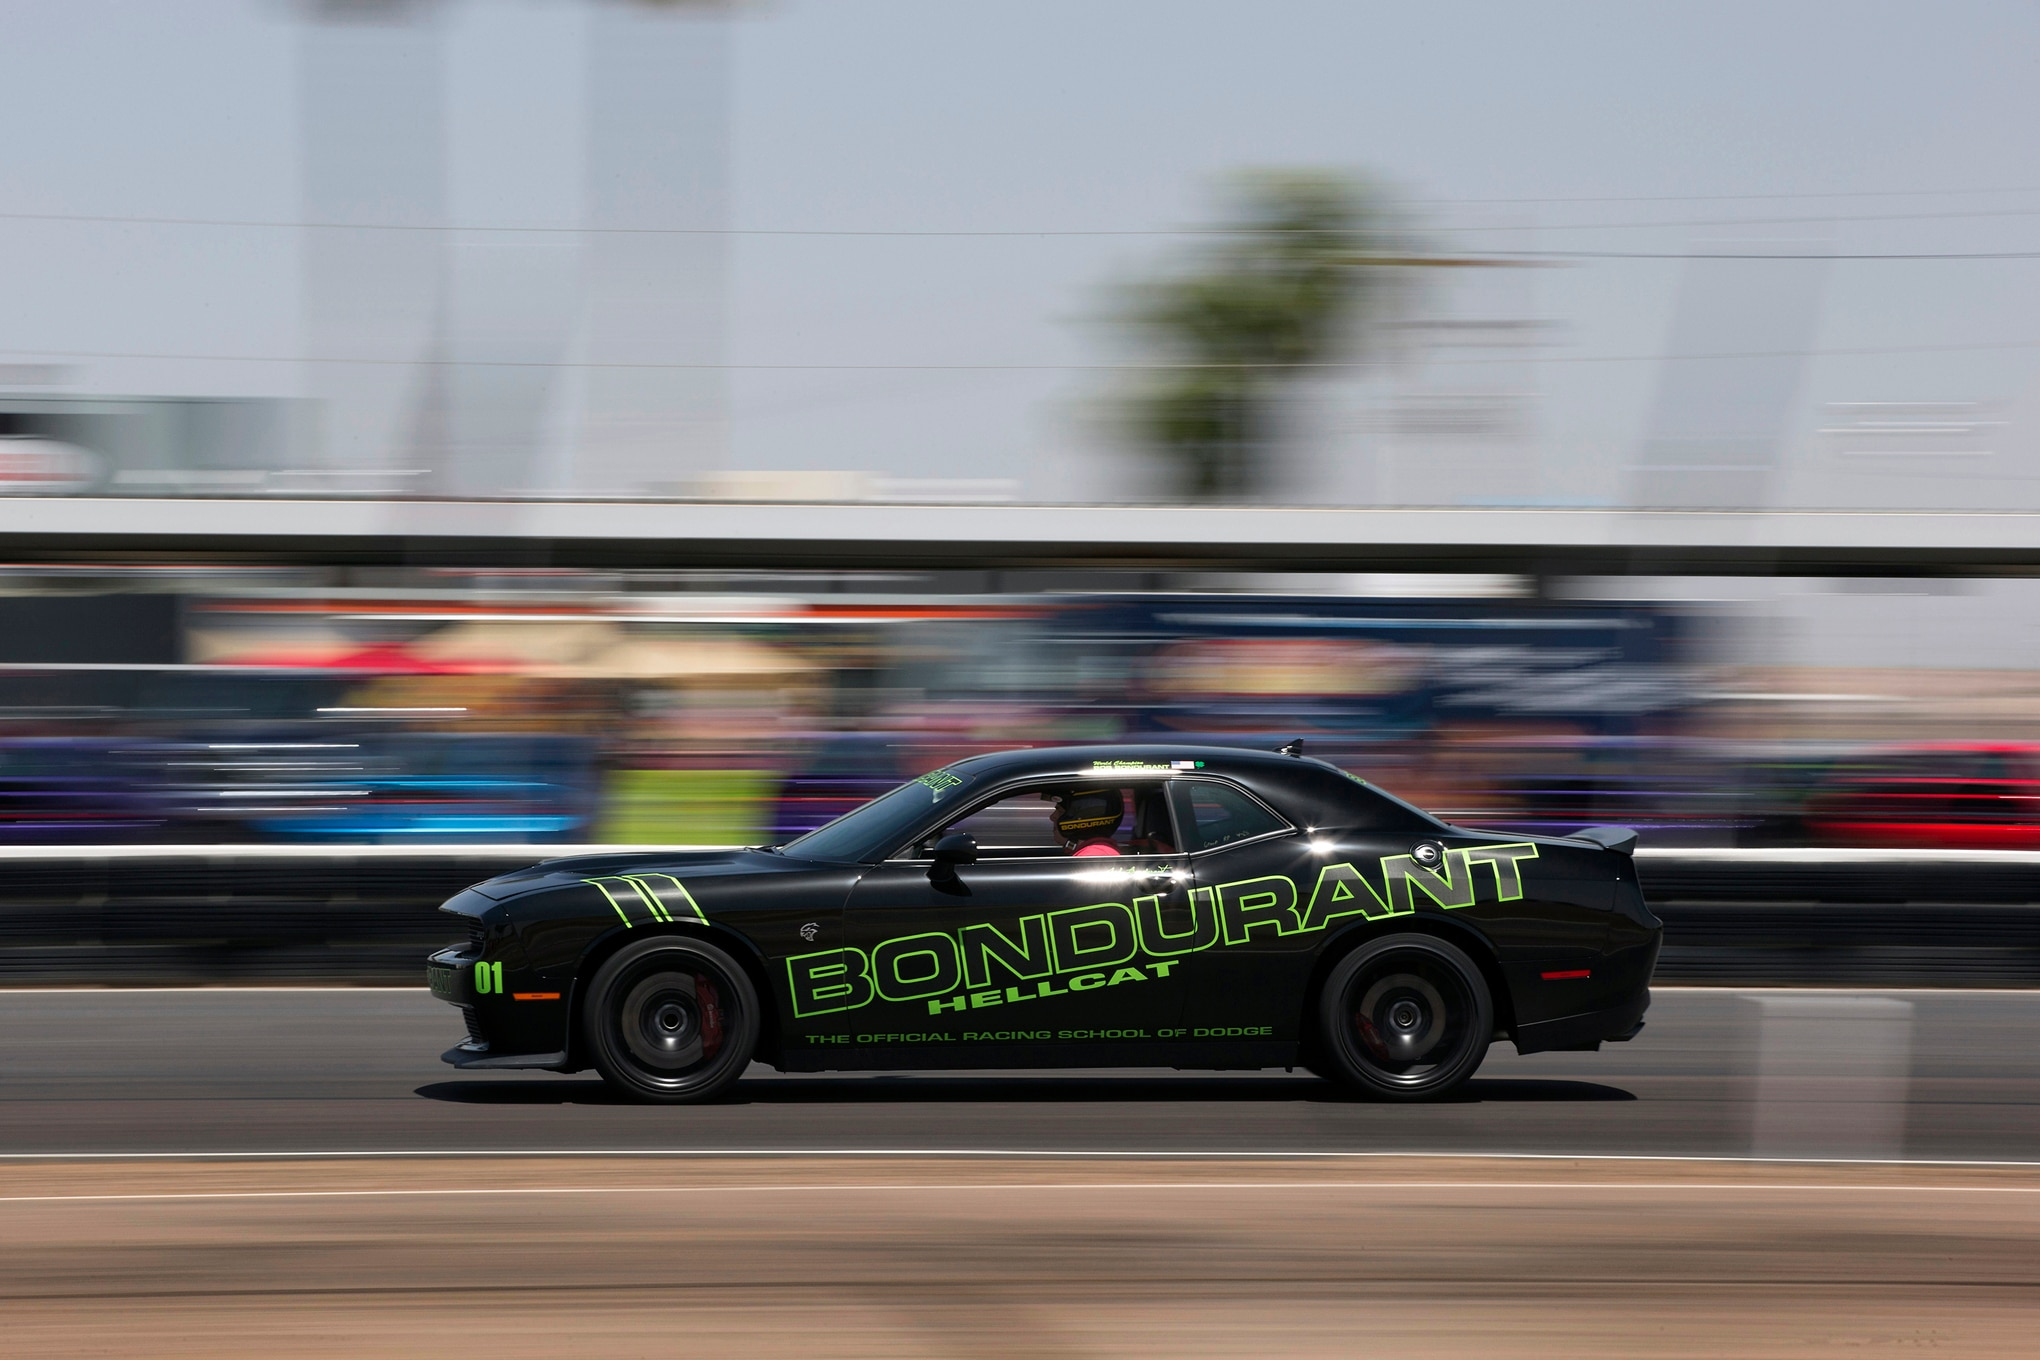 Hooning Vipers And Hellcats At The Srt Bondurant Racing School